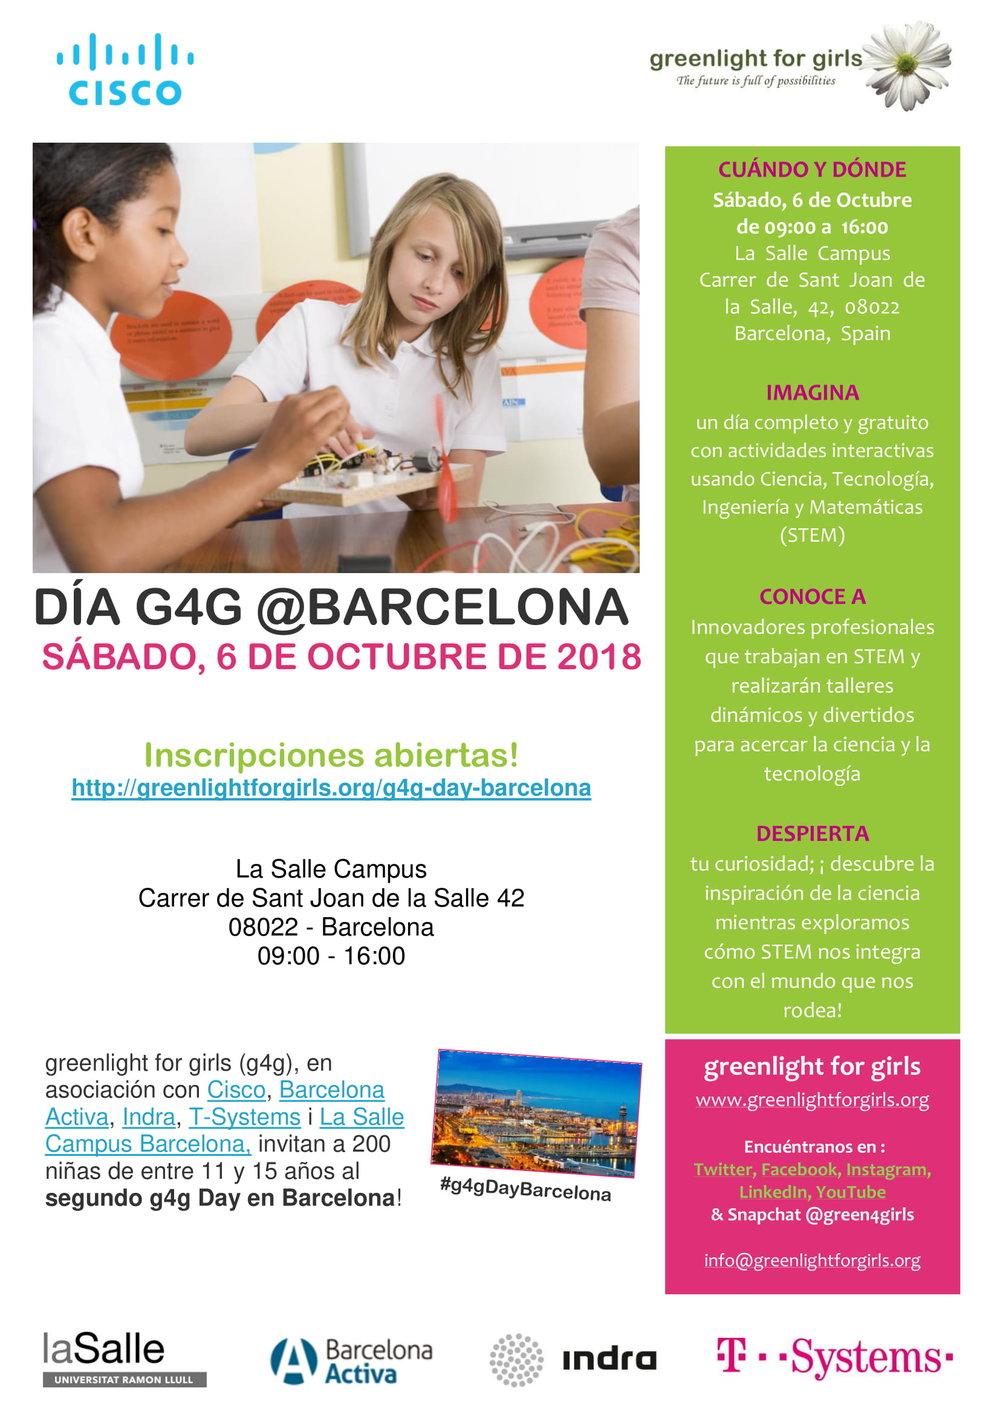 g4g Day Barcelona with Cisco 2018-1.jpg